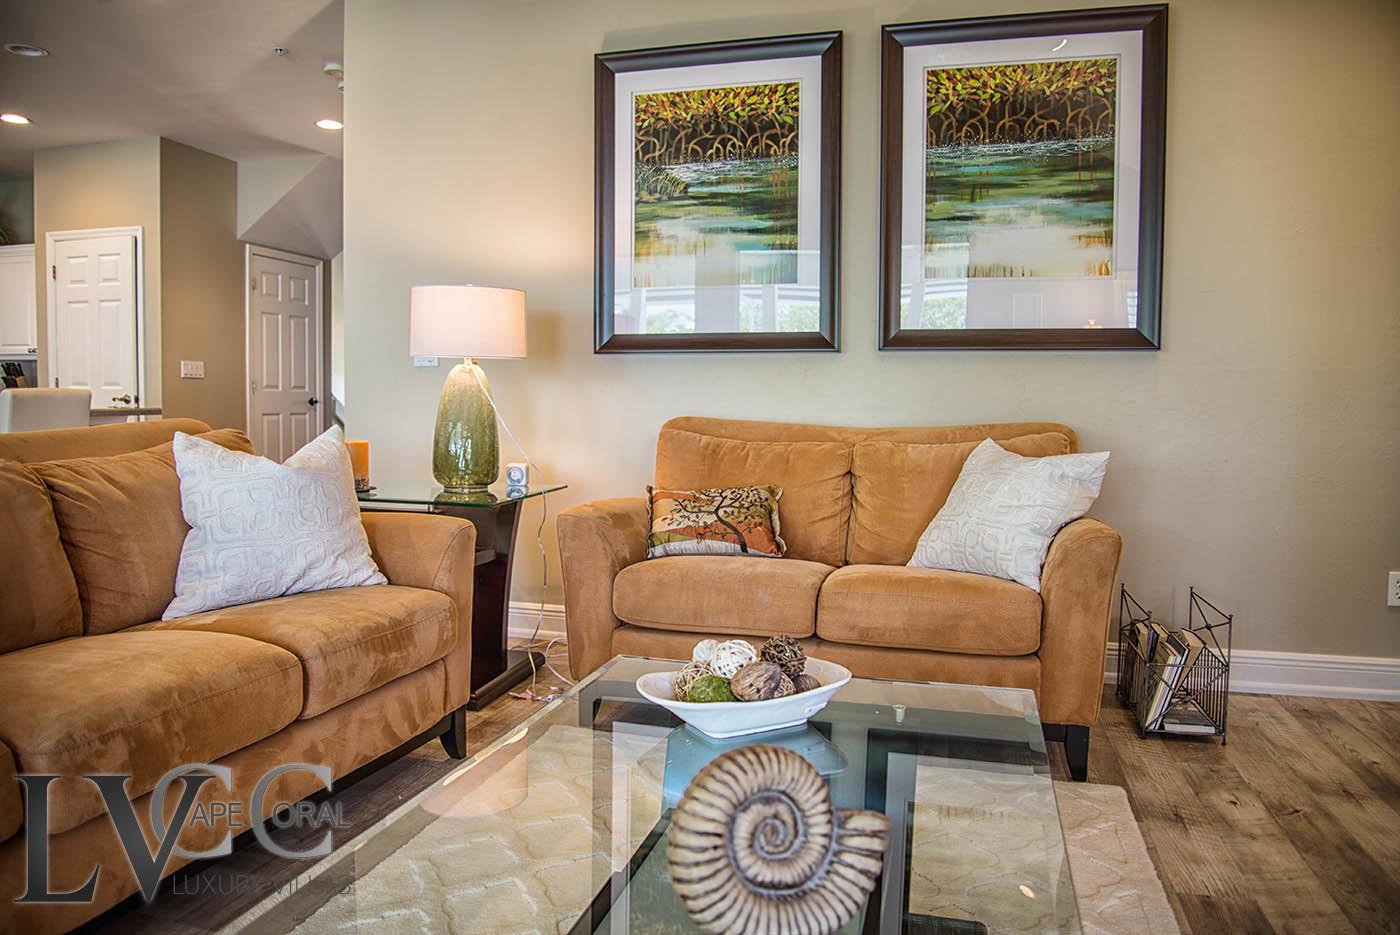 100 kleine couch ikea 3251 big sofa 579fcb13. Black Bedroom Furniture Sets. Home Design Ideas